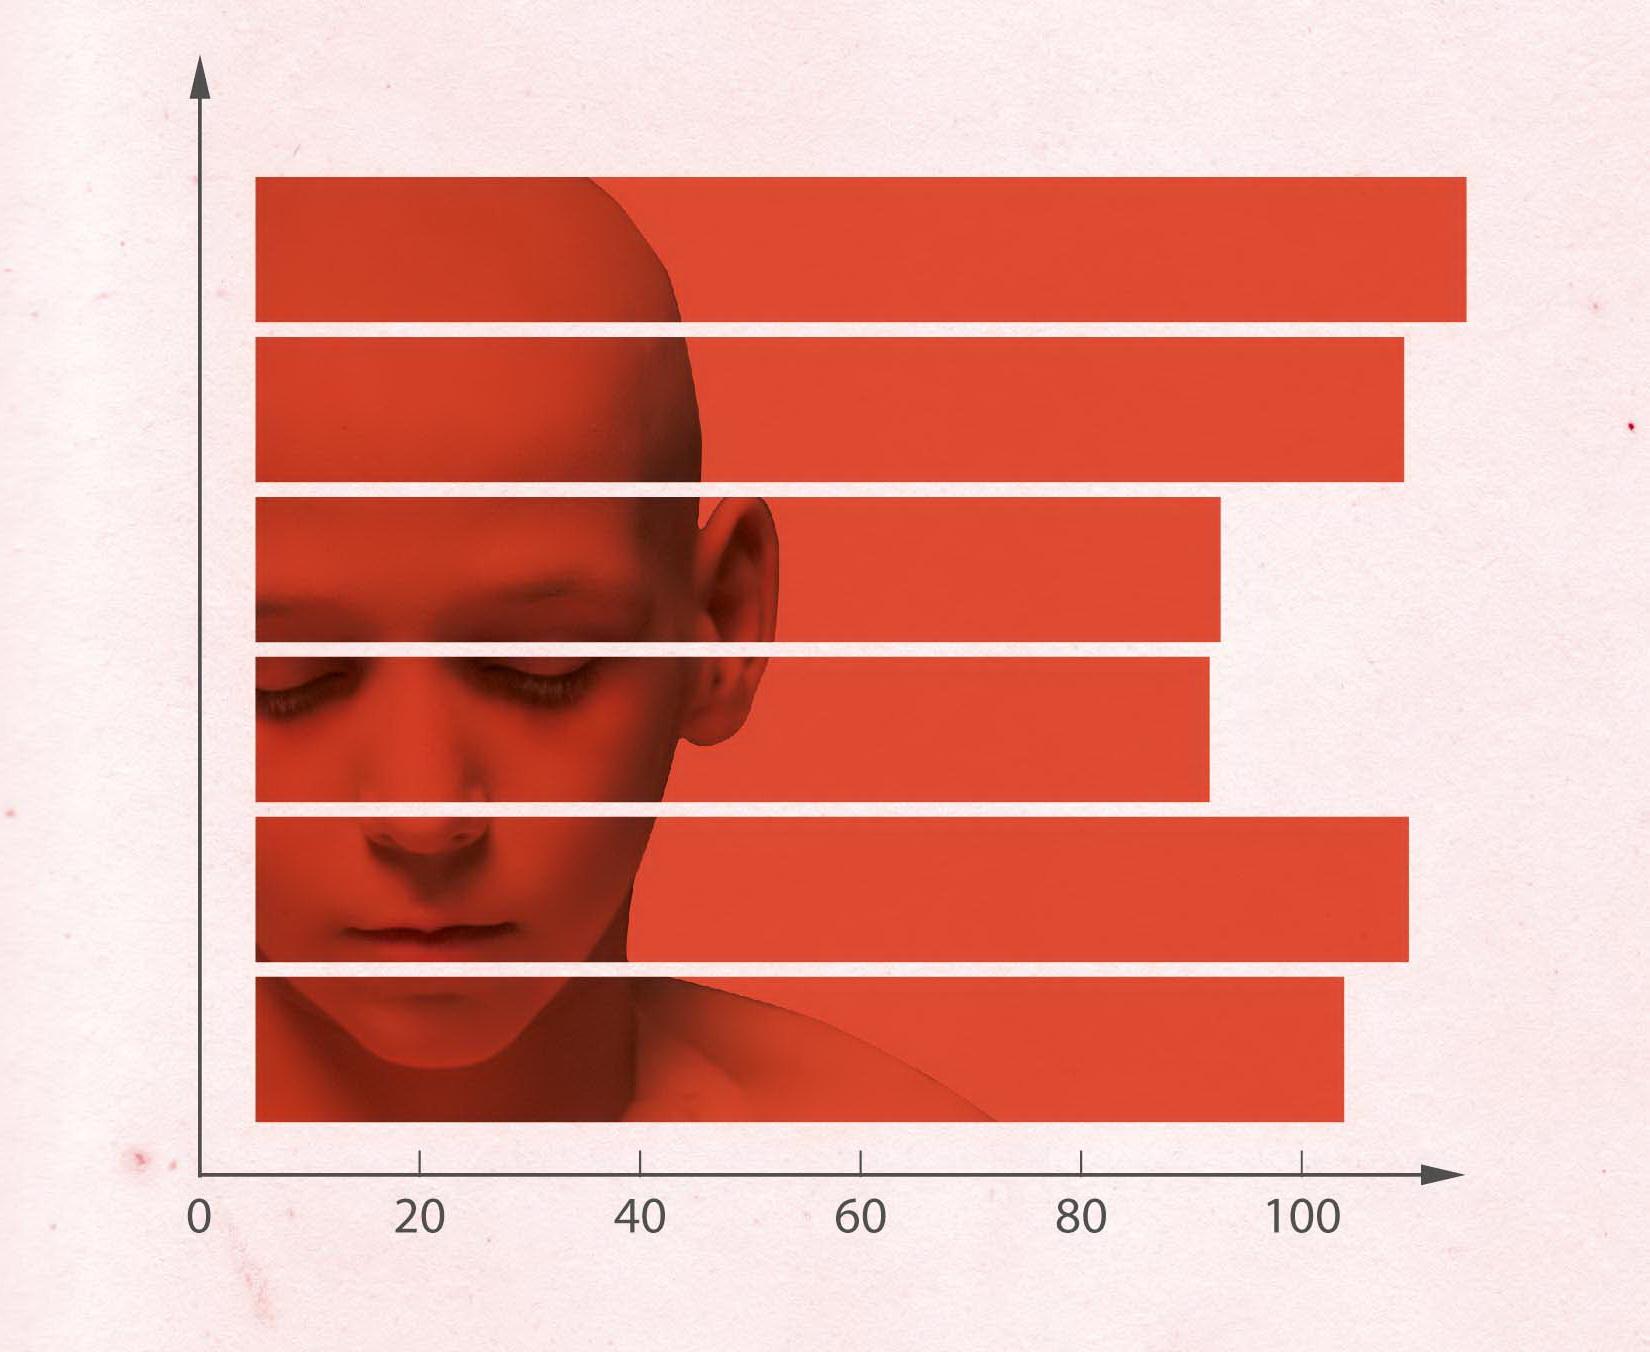 Cifrele inseamna viata: Camere sterile pentru bolnavii de cancer- campanie sustinuta de StirileProTV